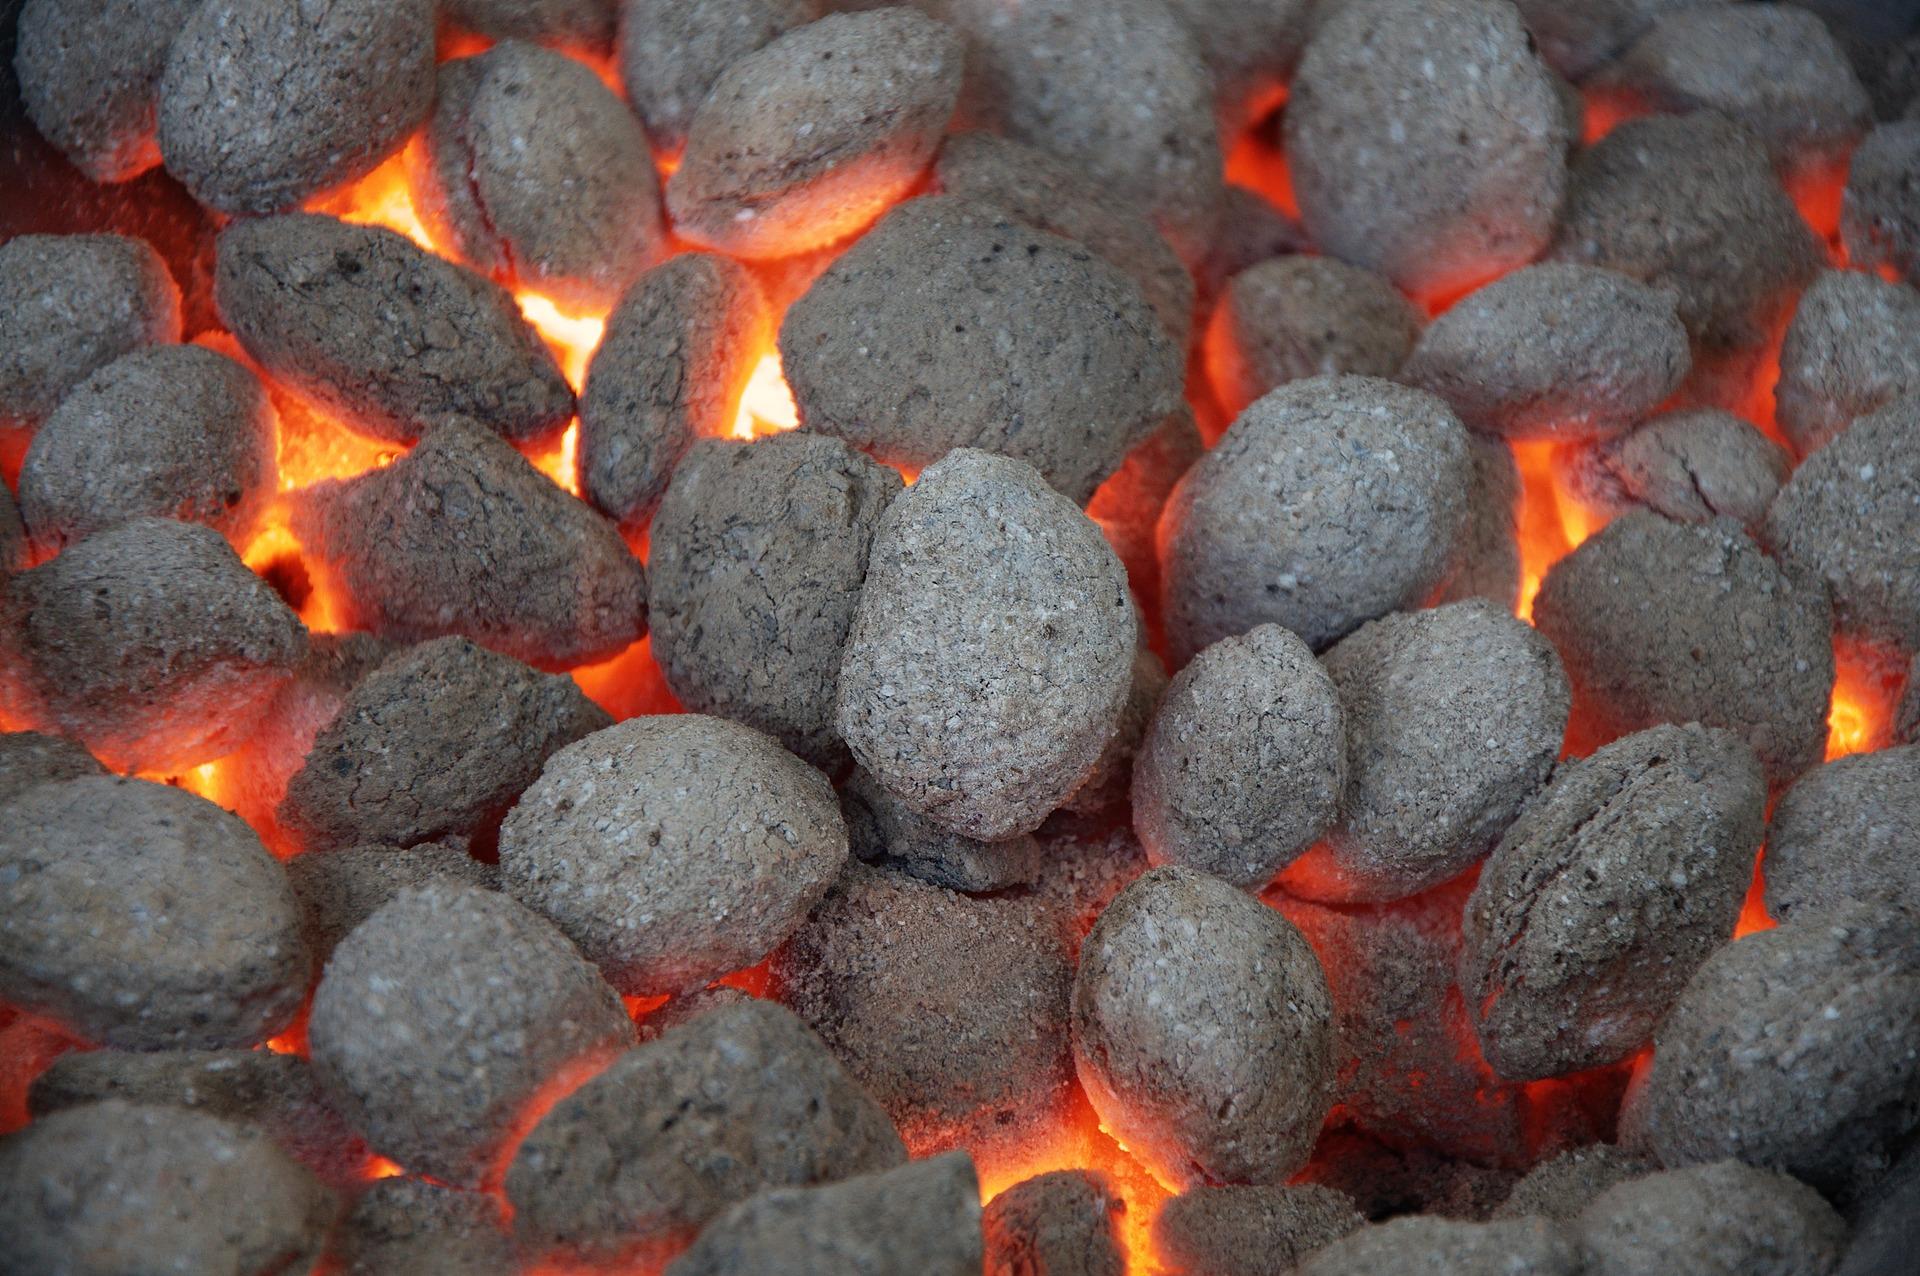 grill węglowy a grill gazowy , grill360 , grill , grille ogrodowe